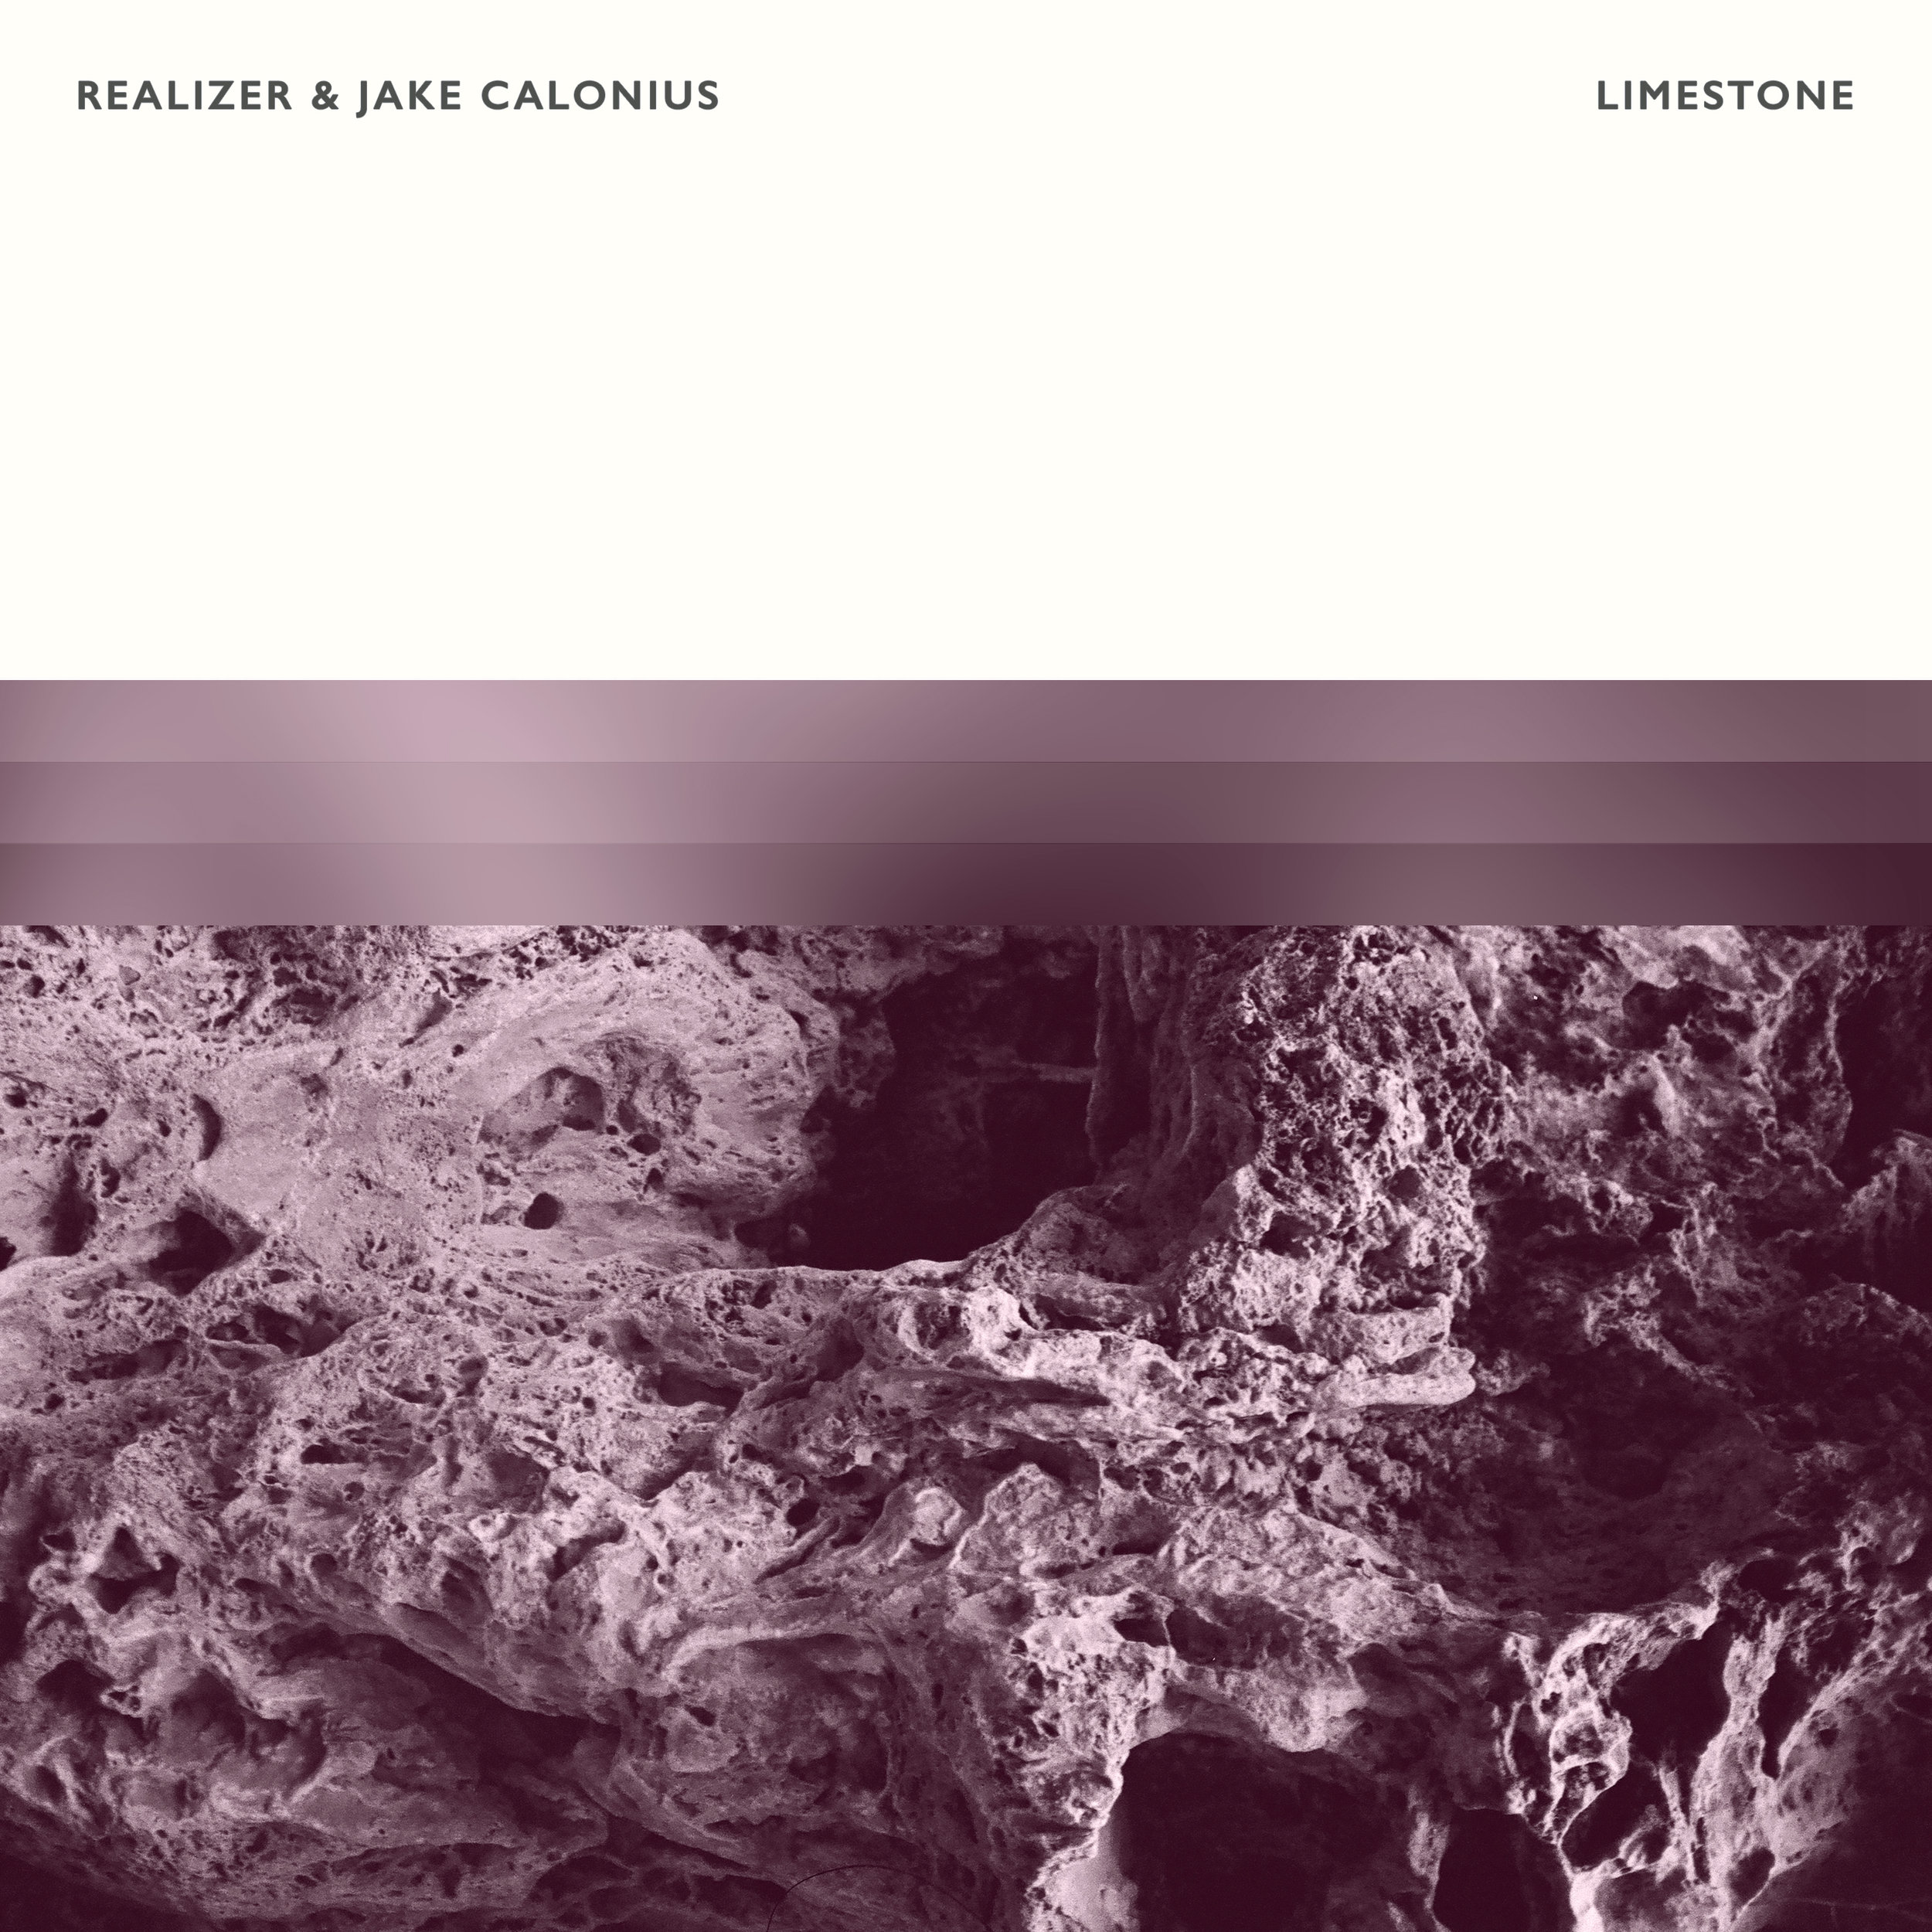 Realizer & Jake Calonius - Limestone